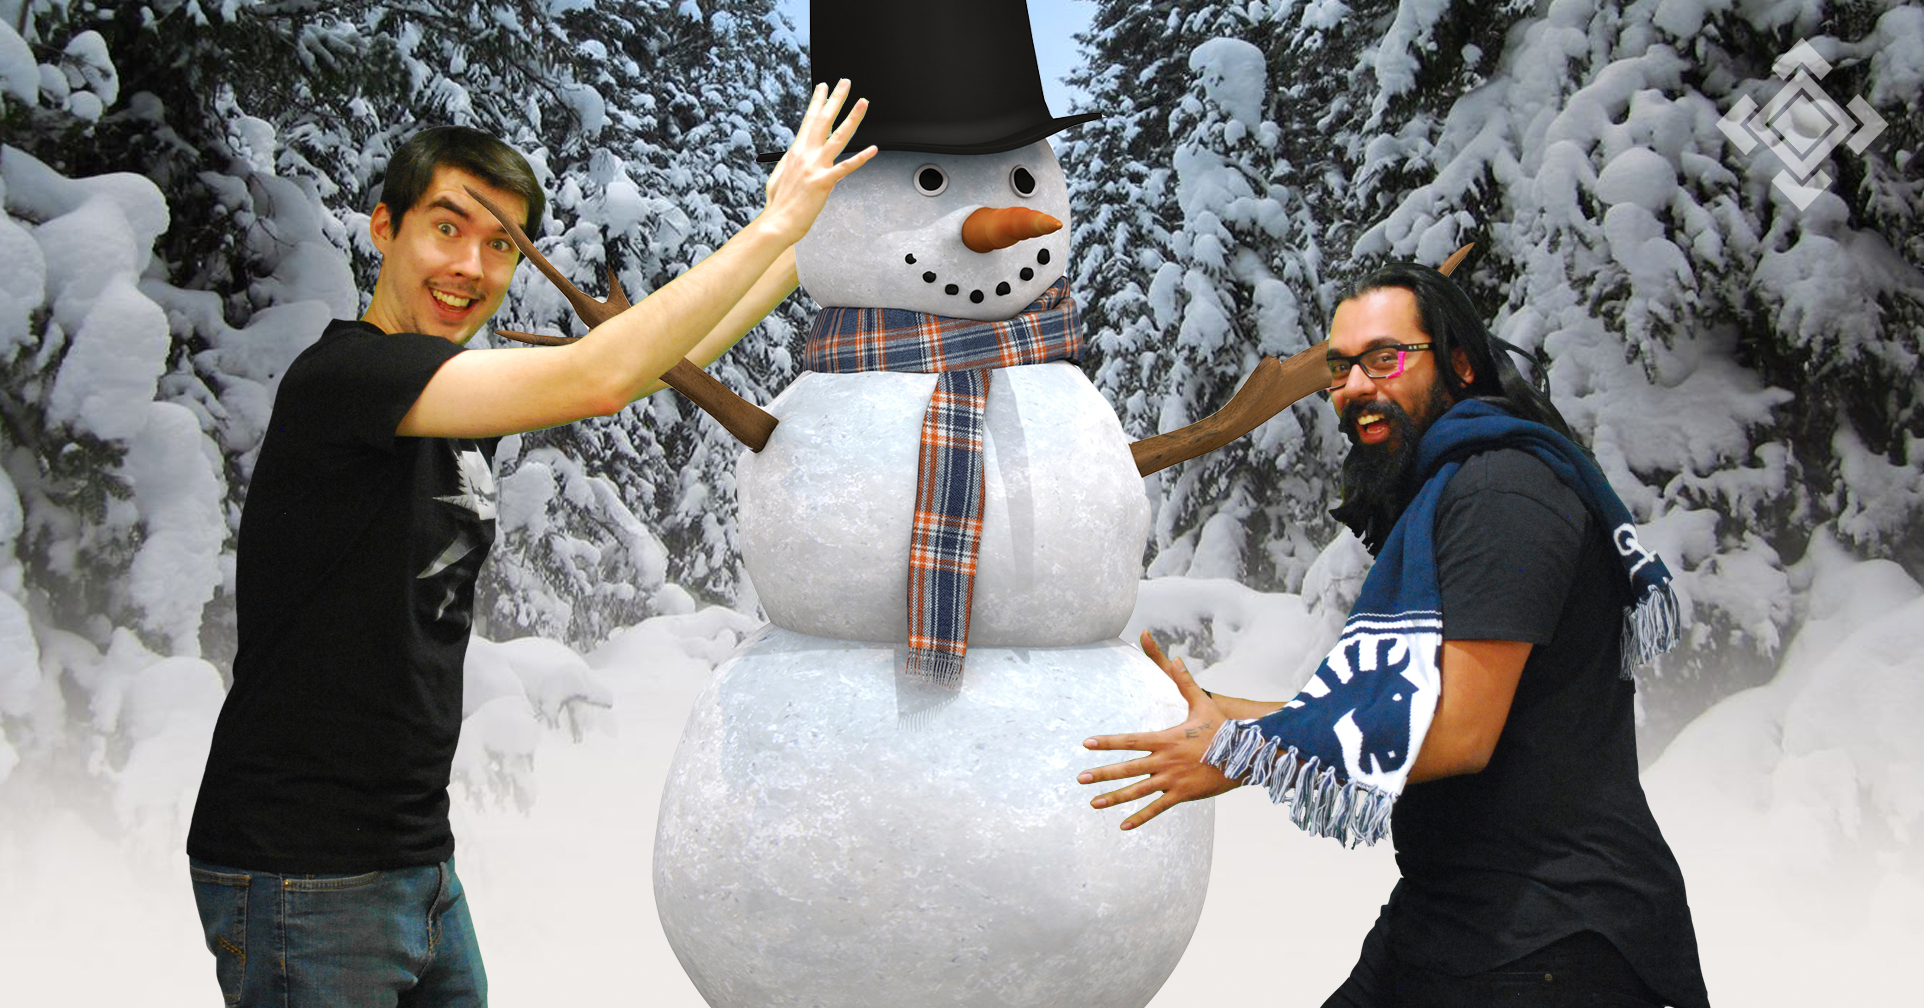 Building an eSports snowman